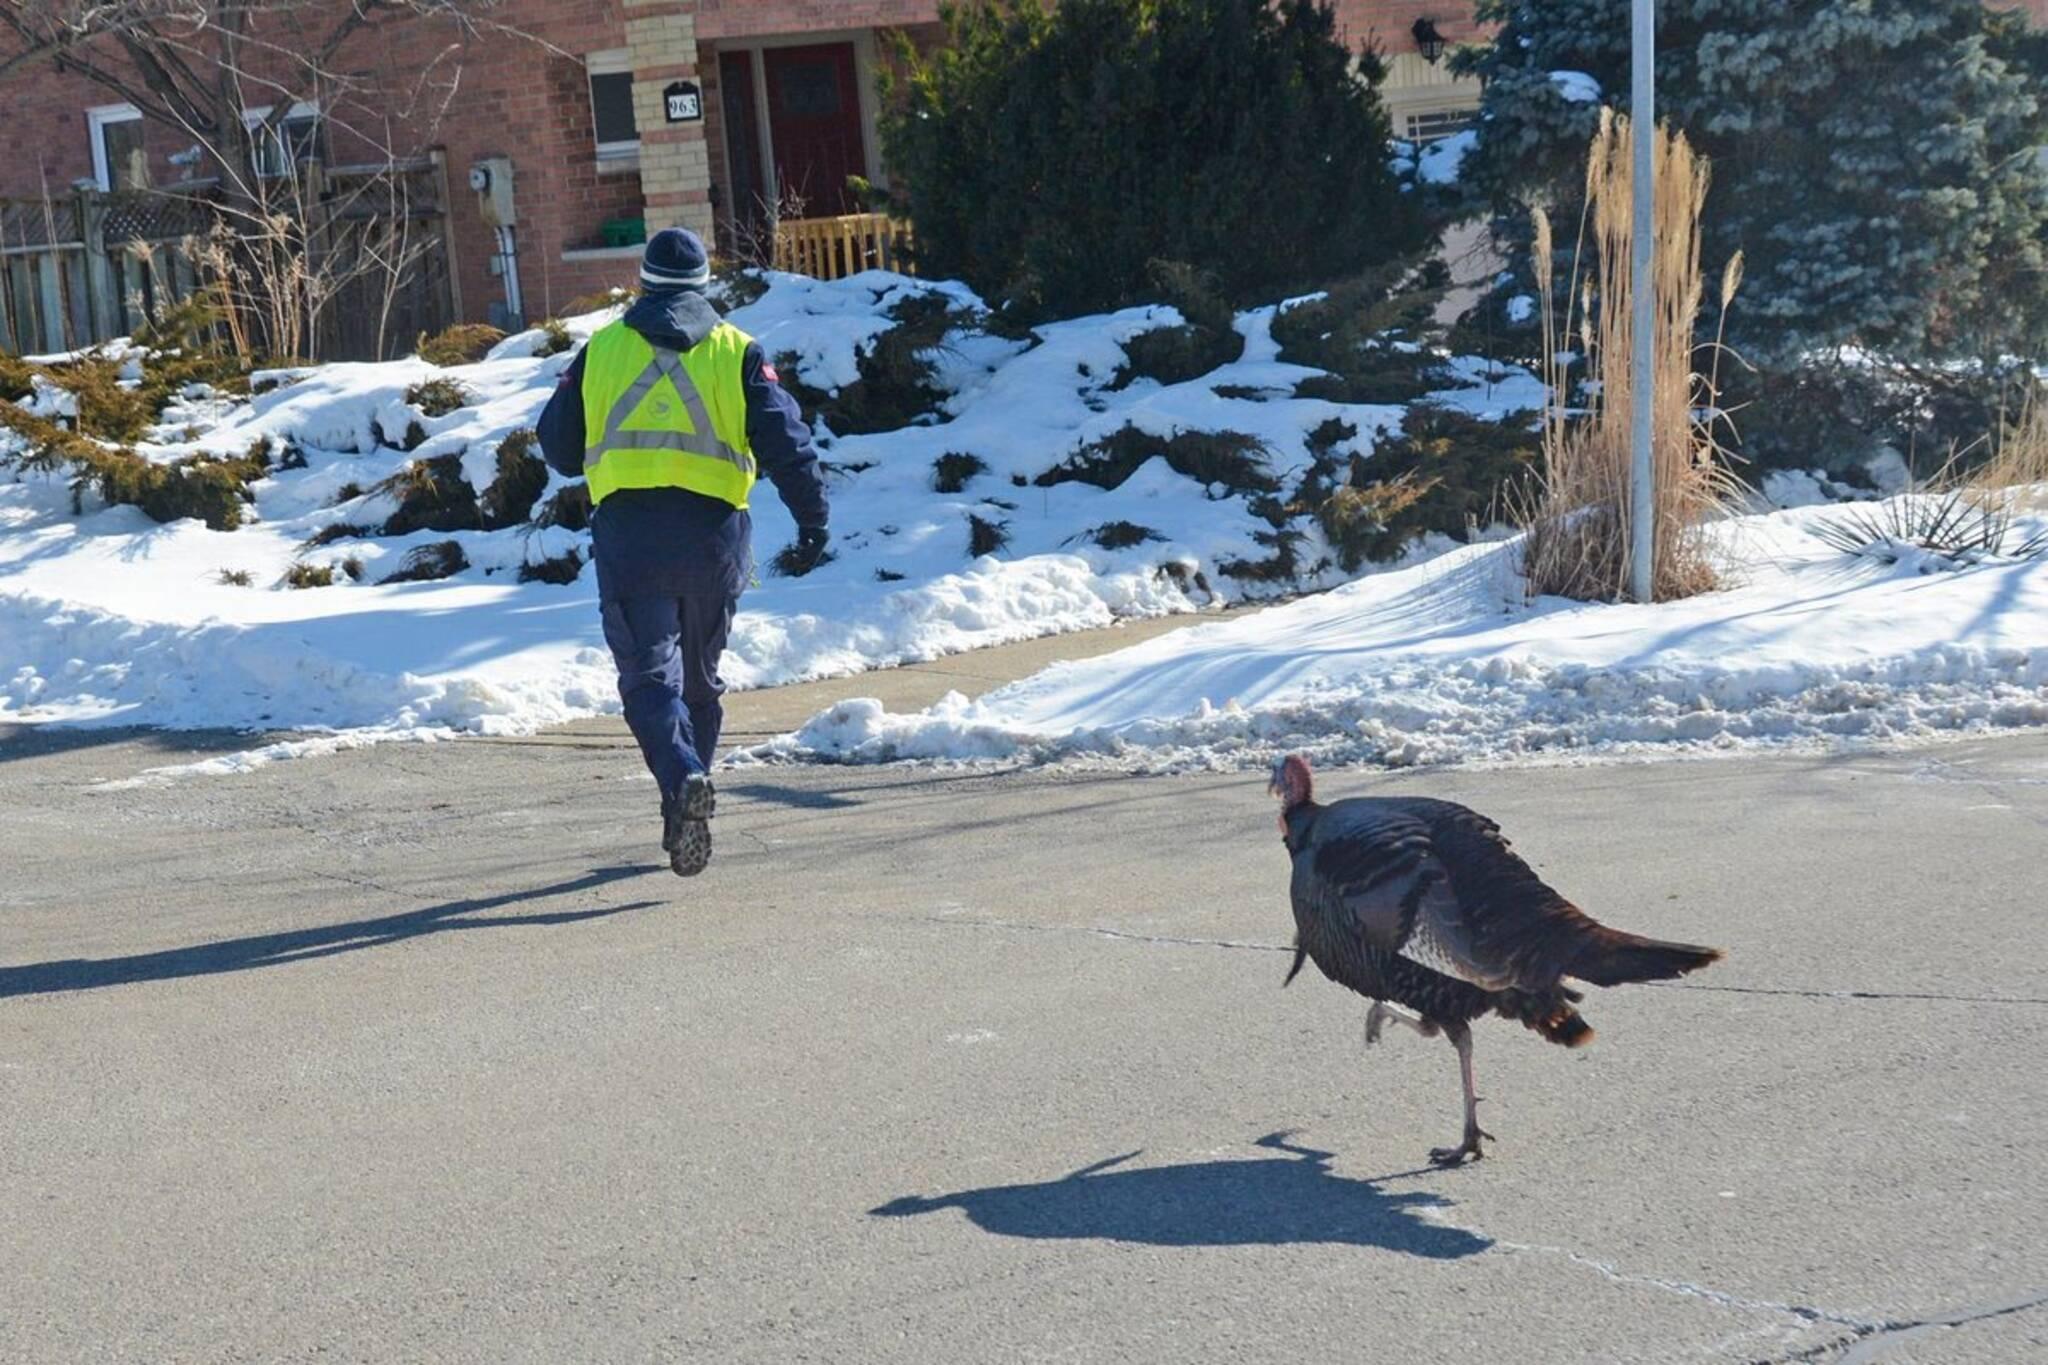 mississauga turkey attack